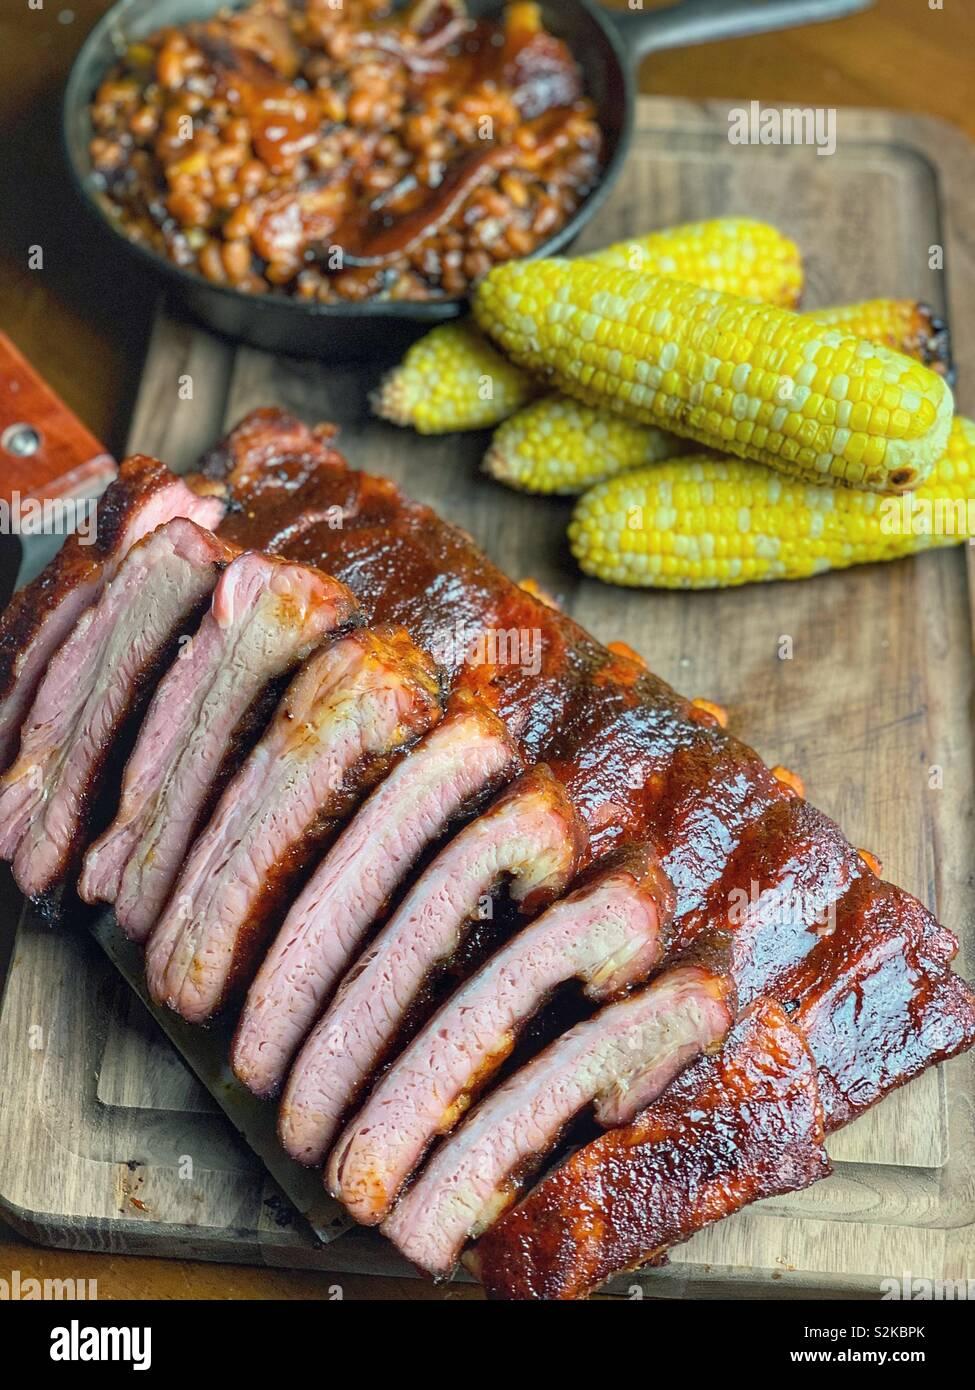 St louis style pork ribs Stock Photo